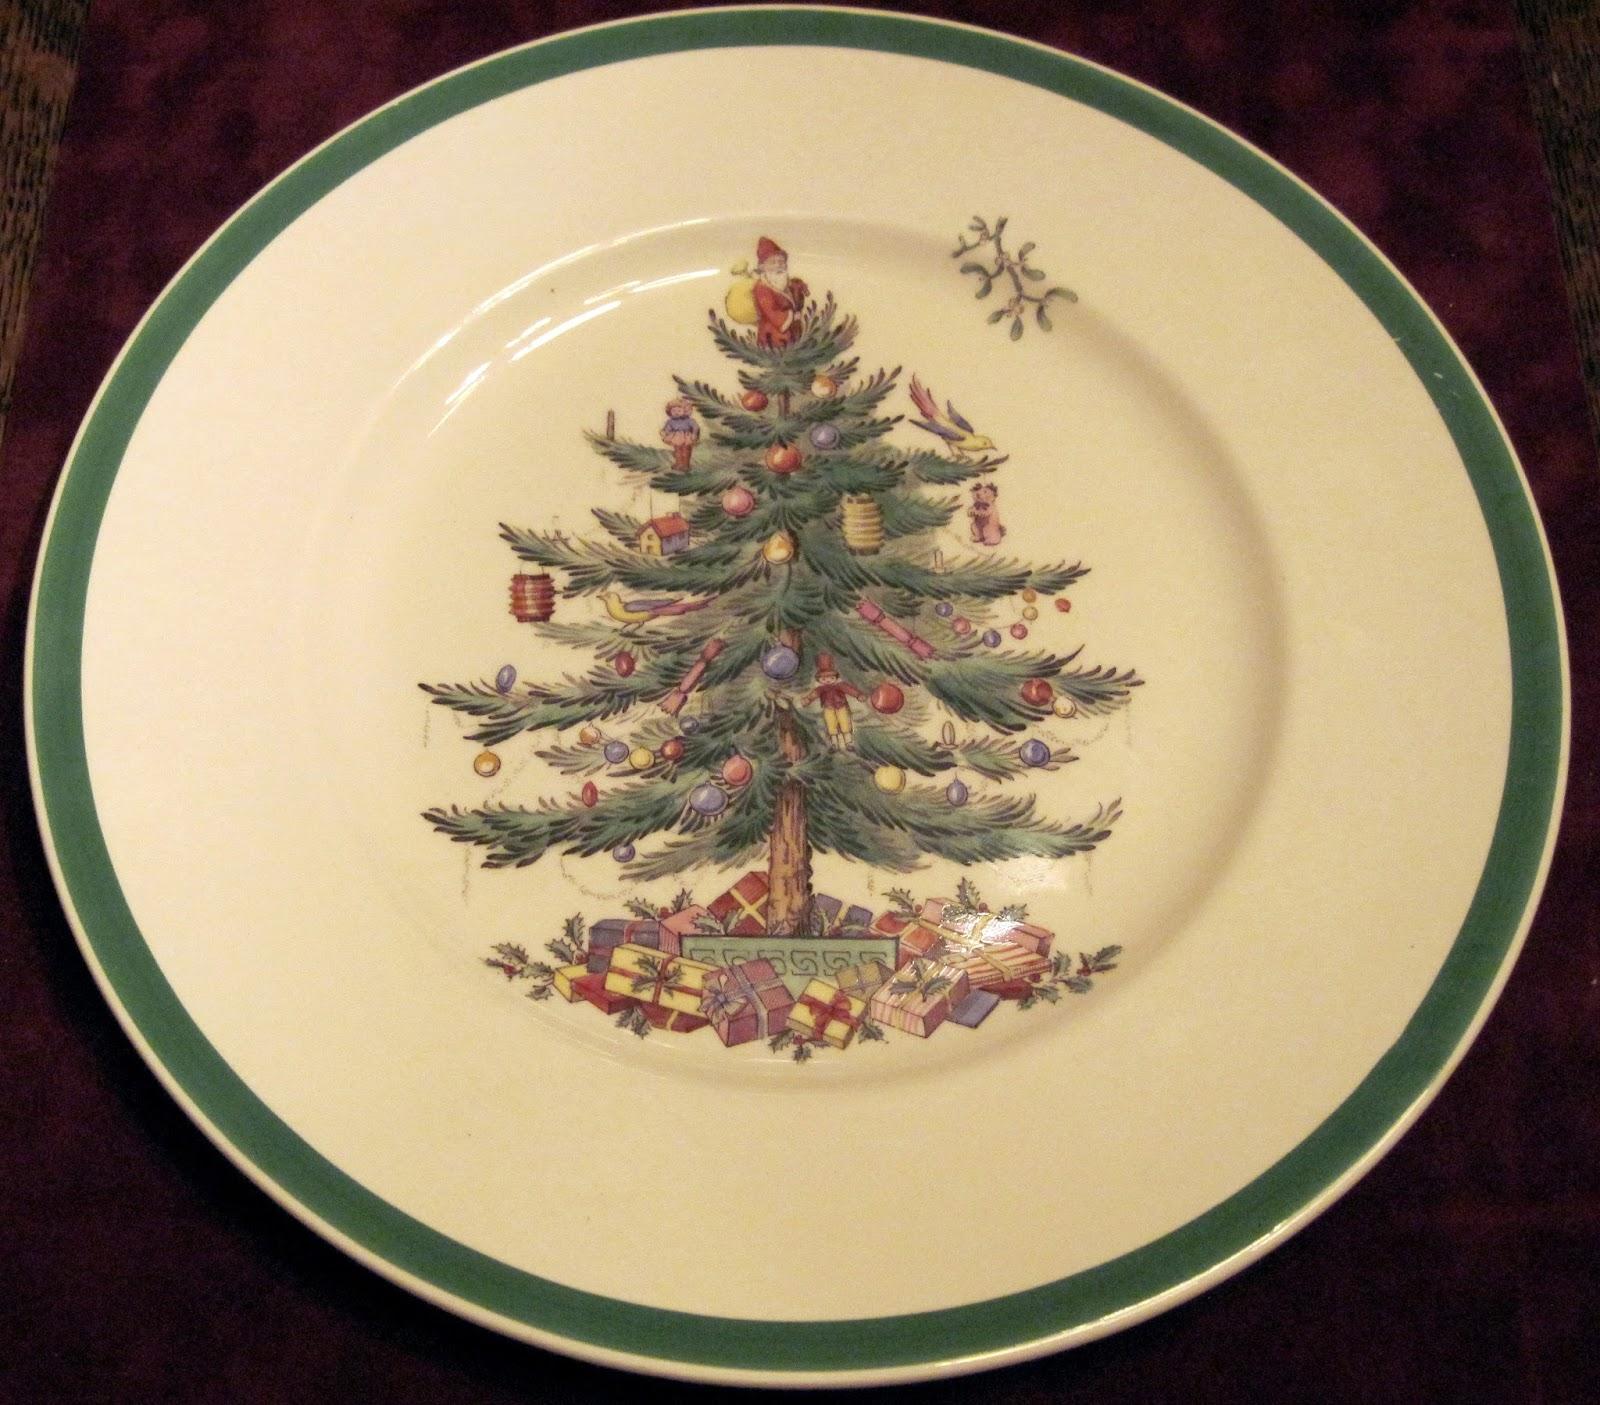 Spode Christmas Plates.Spode History Spode Christmas Tree And New Information